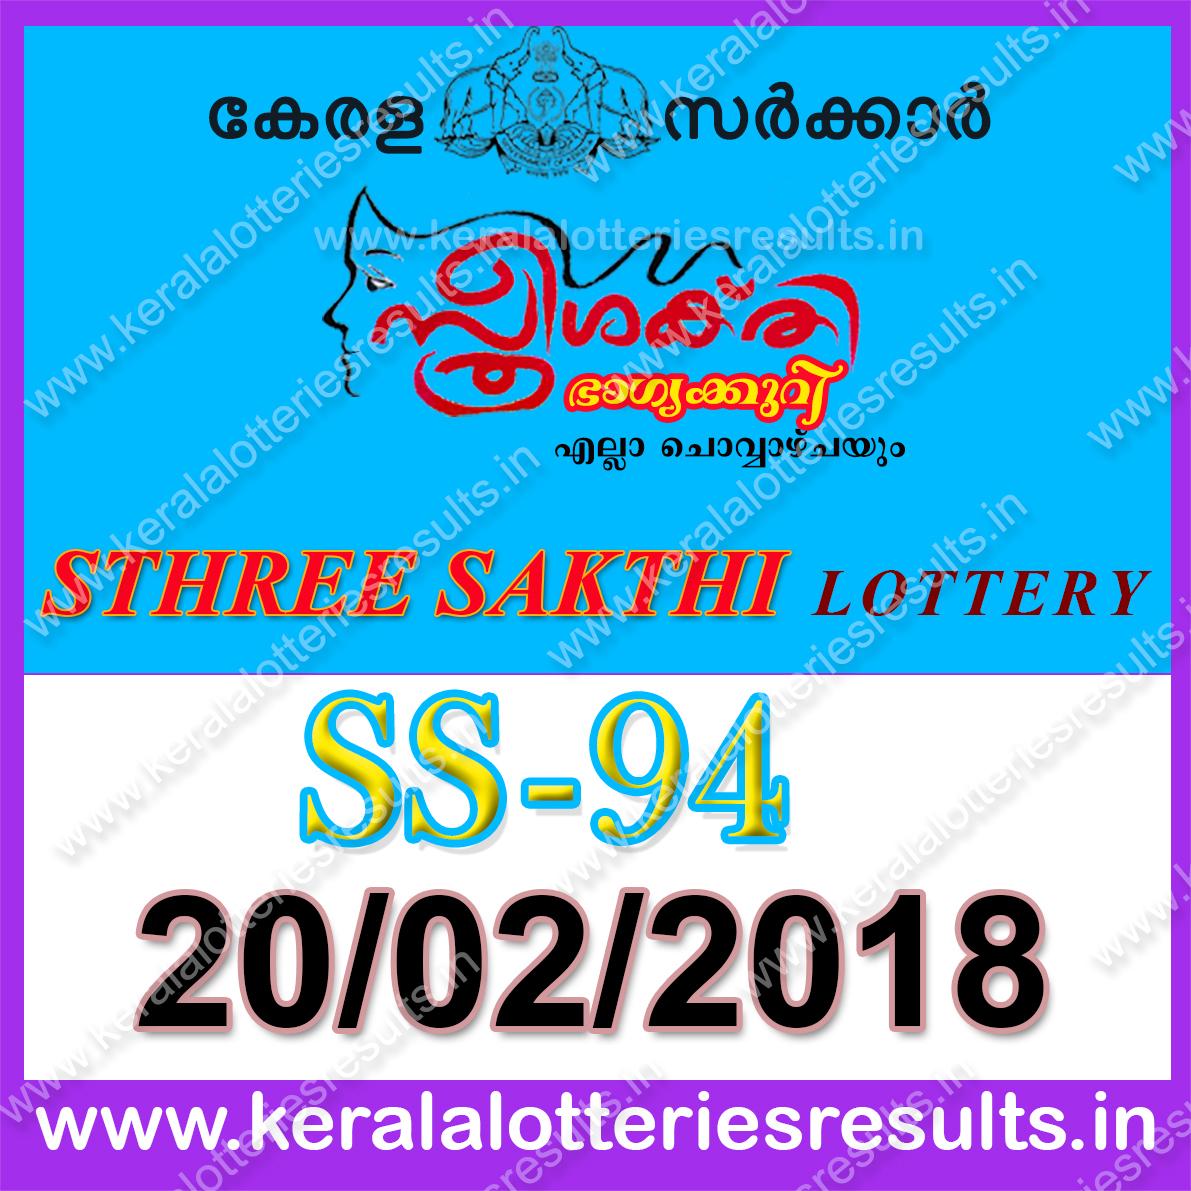 "Kerala Lottery Result; 20-02-2018 ""Sthree Sakthi Lottery ..."